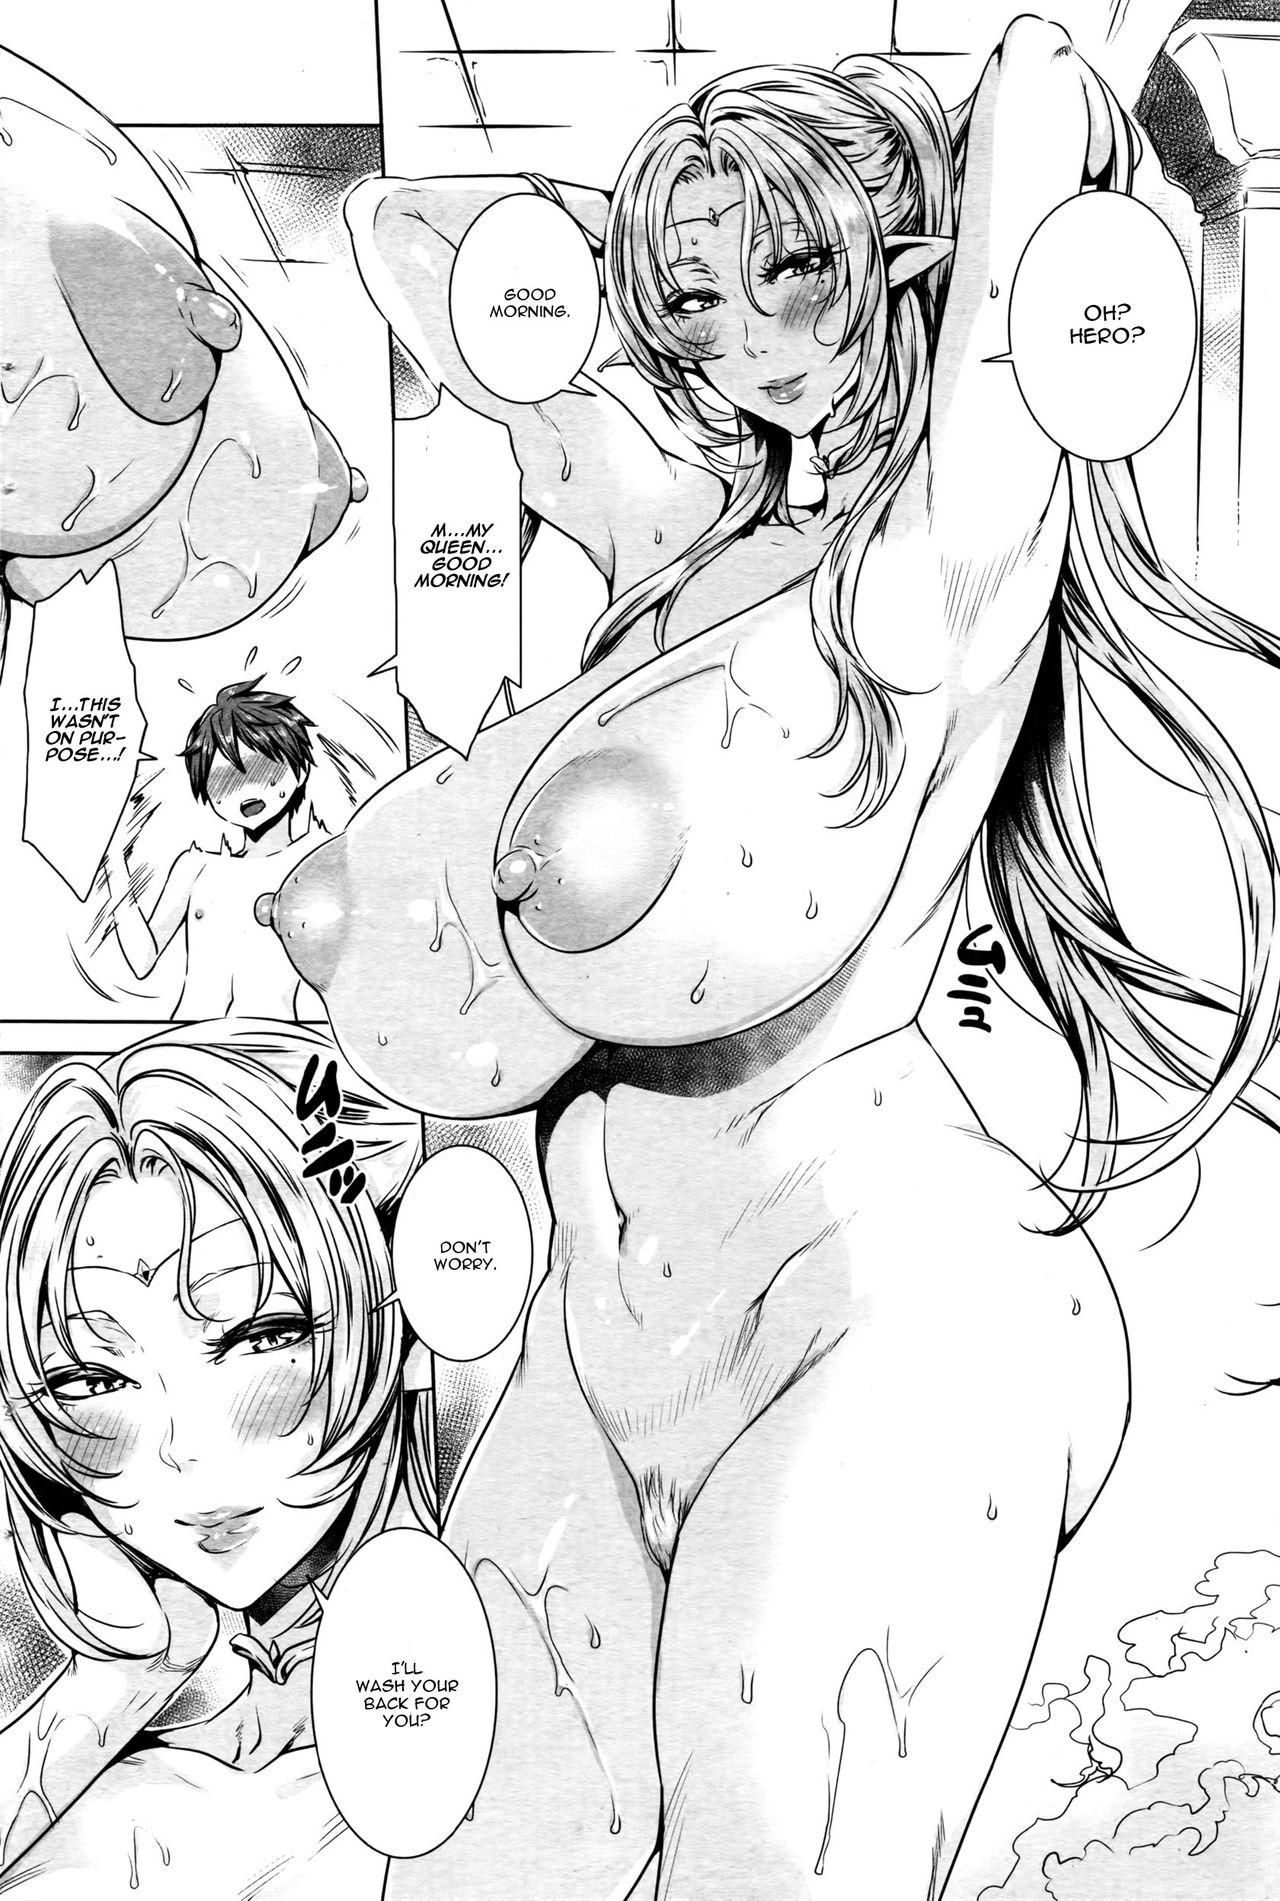 Ippai Itte ne, Yuusha-sama   Please Cum Lots ♪ Lord Hero ♥ 20